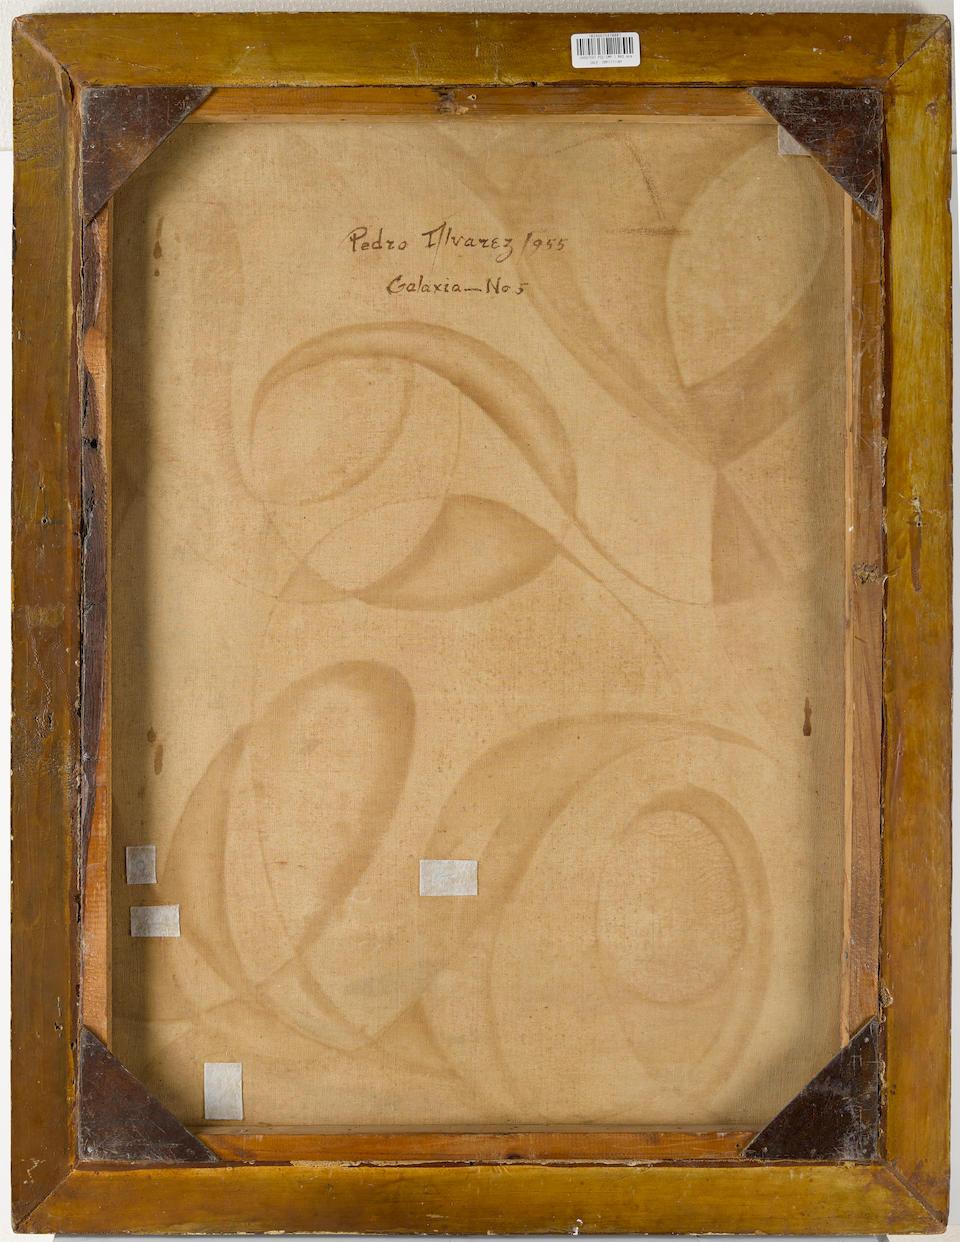 Pedro Alvarez (1967-2004) Galaxia - No.5 31 3/8 x 23 3/8 in (79.7 x 59.6 cm) (Painted in 1955)